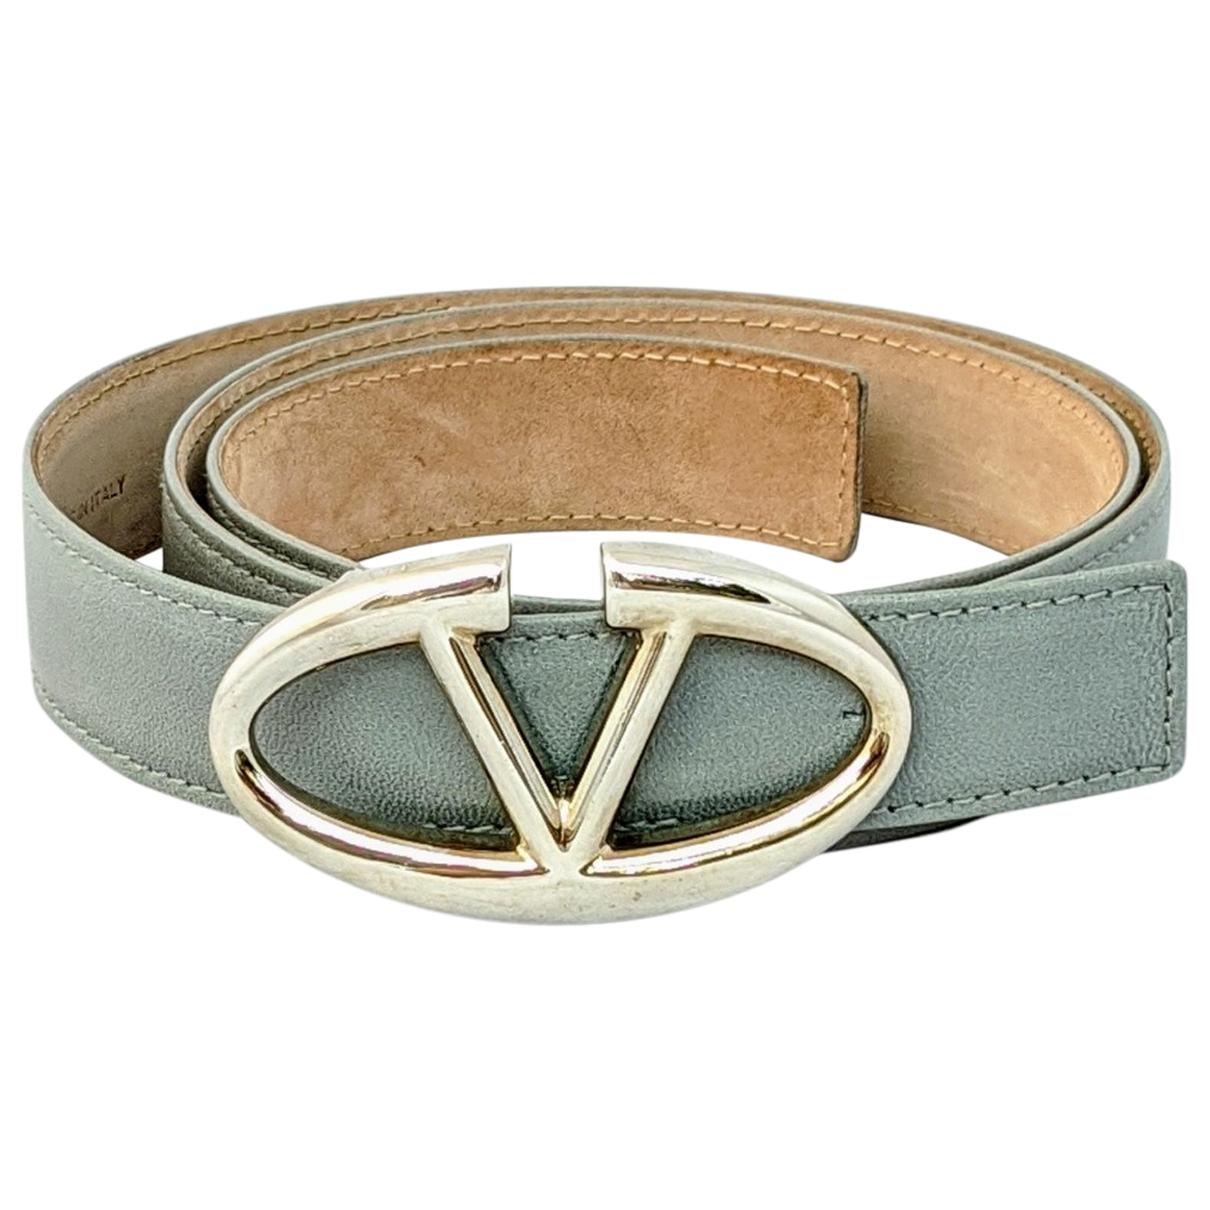 Valentino Garavani \N Grey Leather belt for Women 90 cm